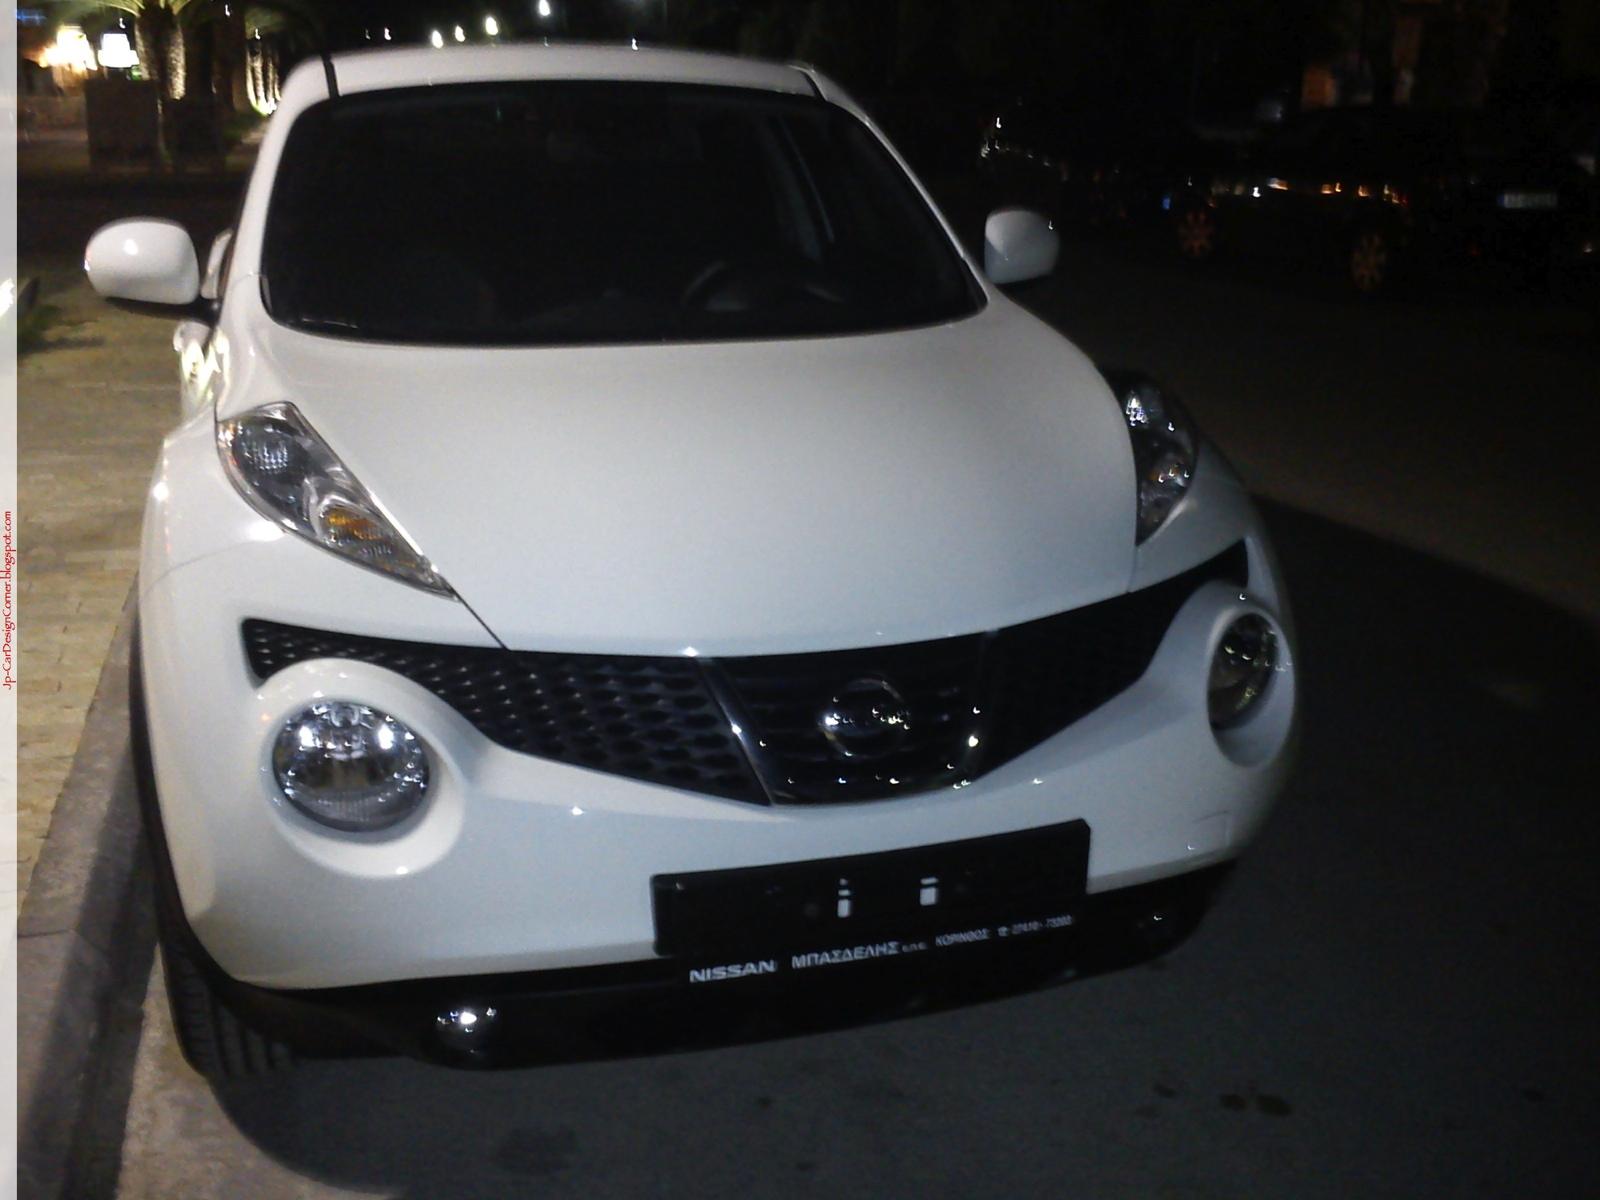 Nissan Juke Demo Car For Sale